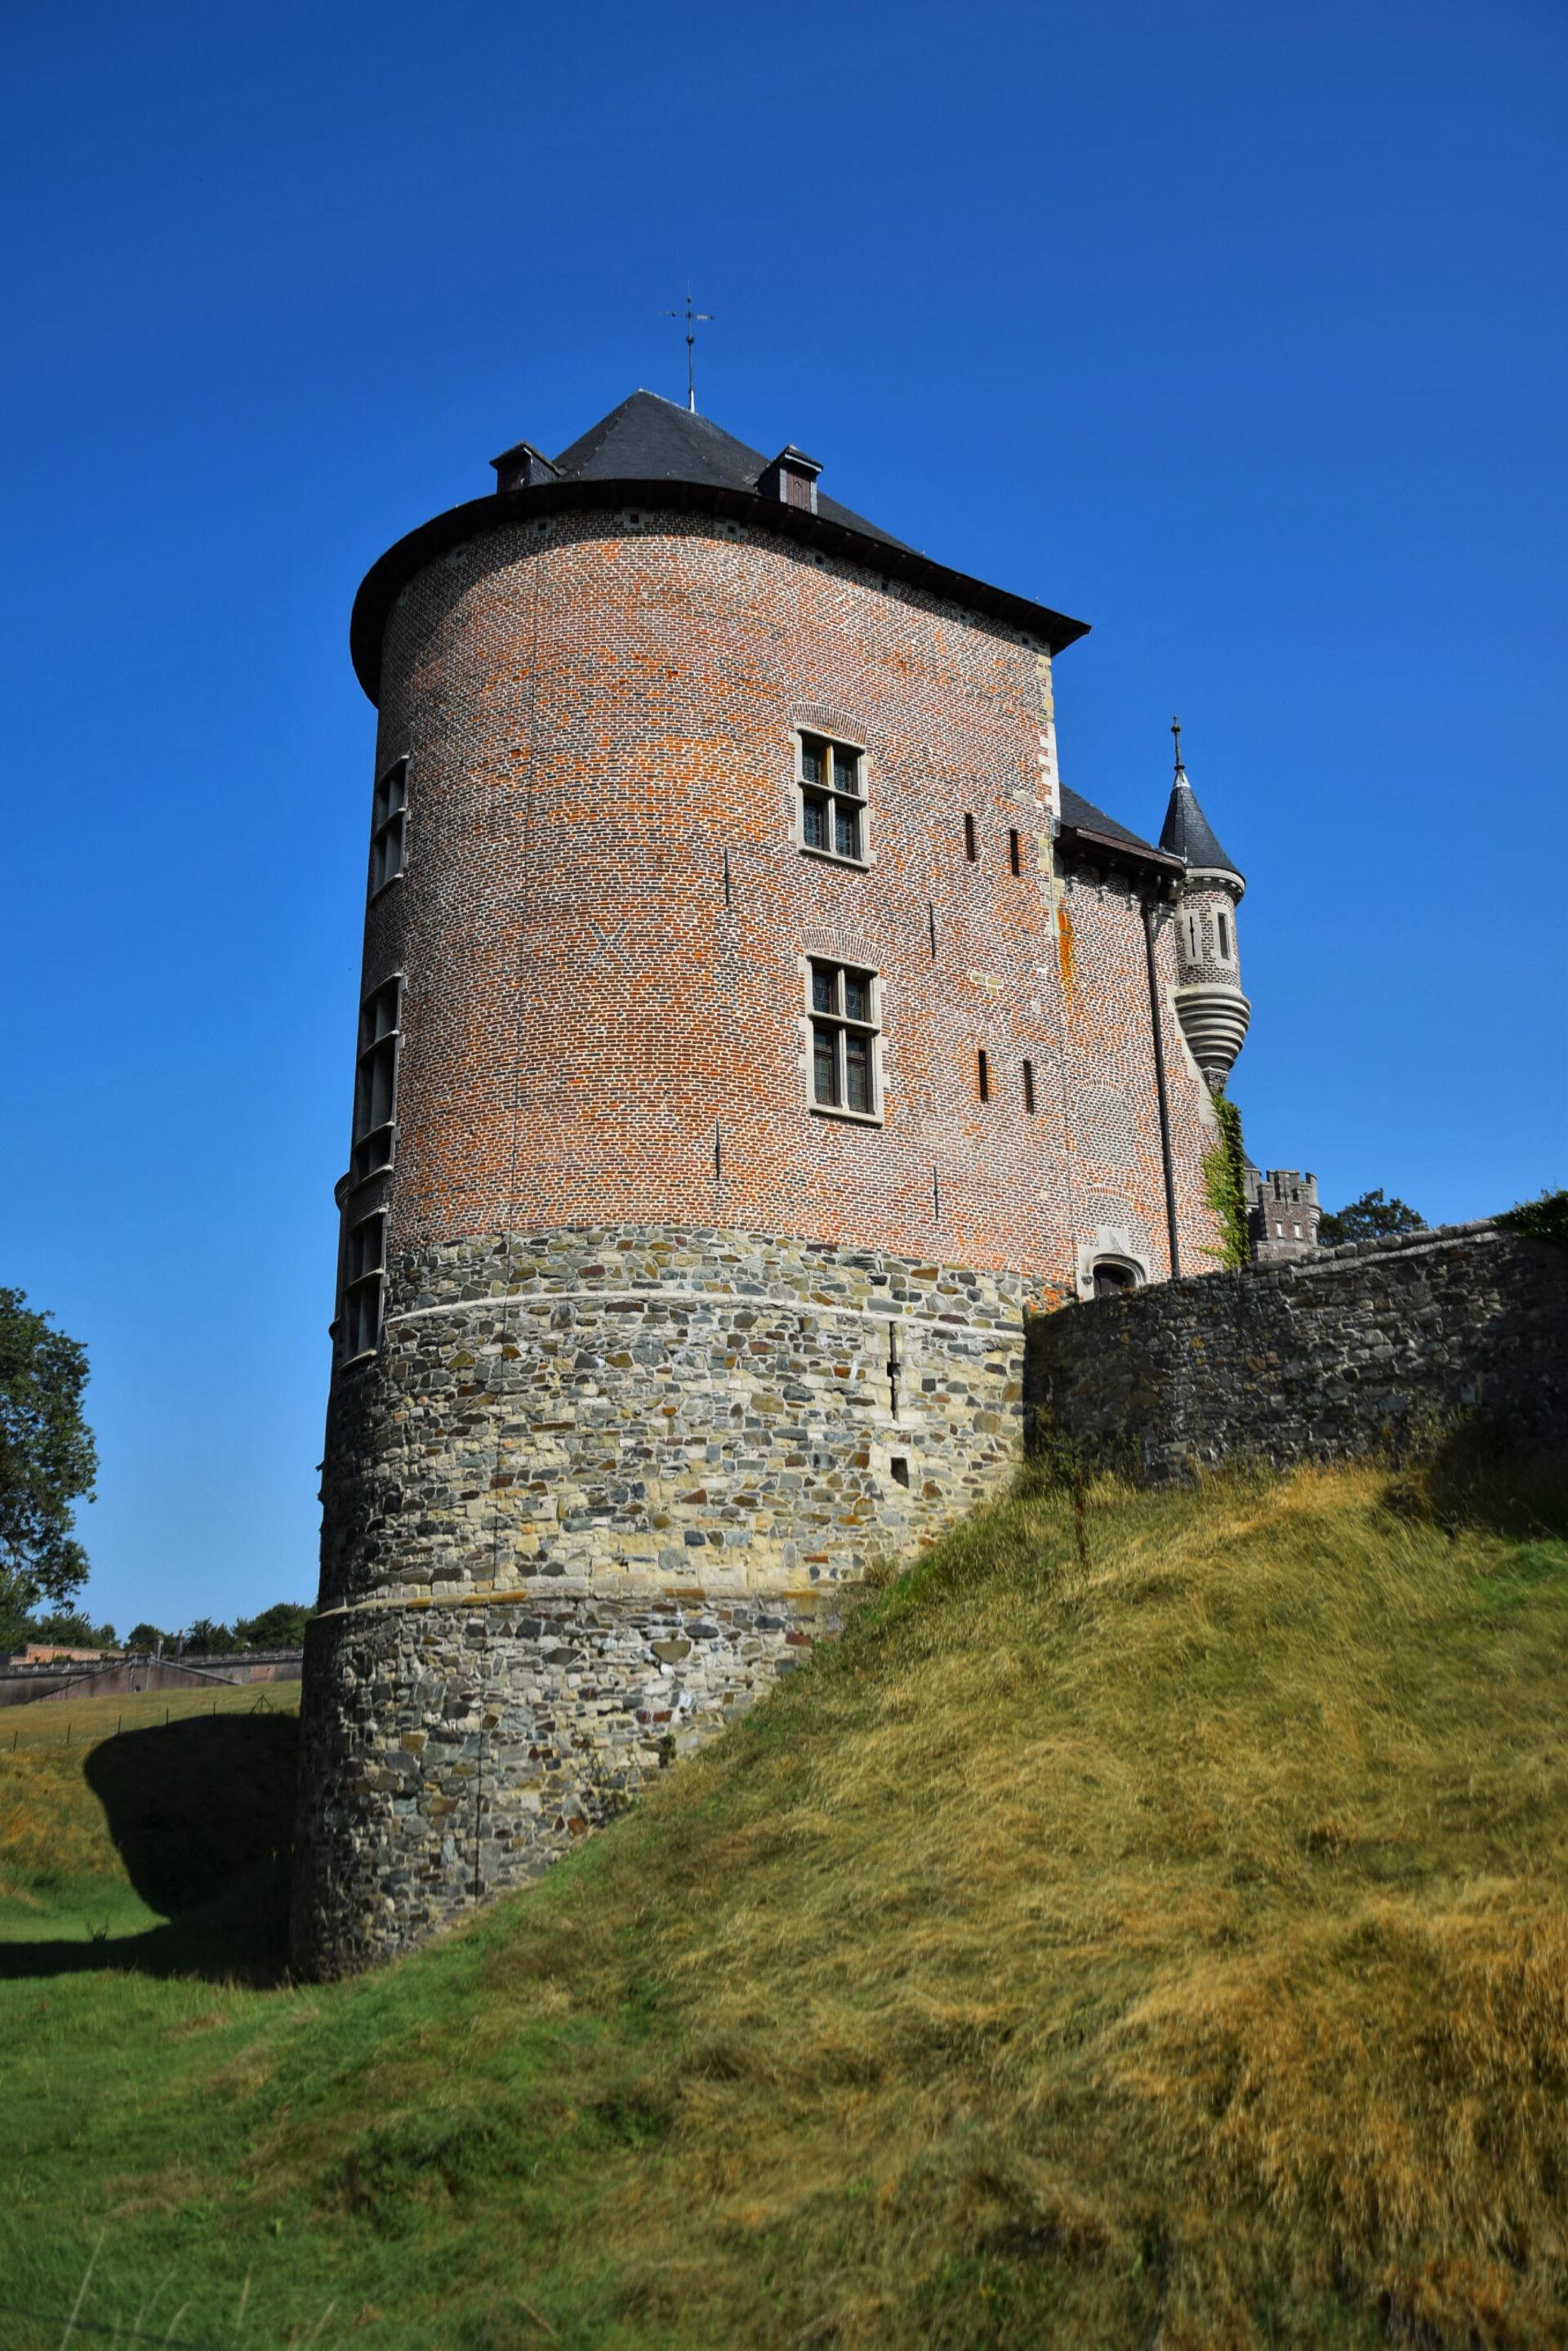 Гаасбек. Часть 2. Замок